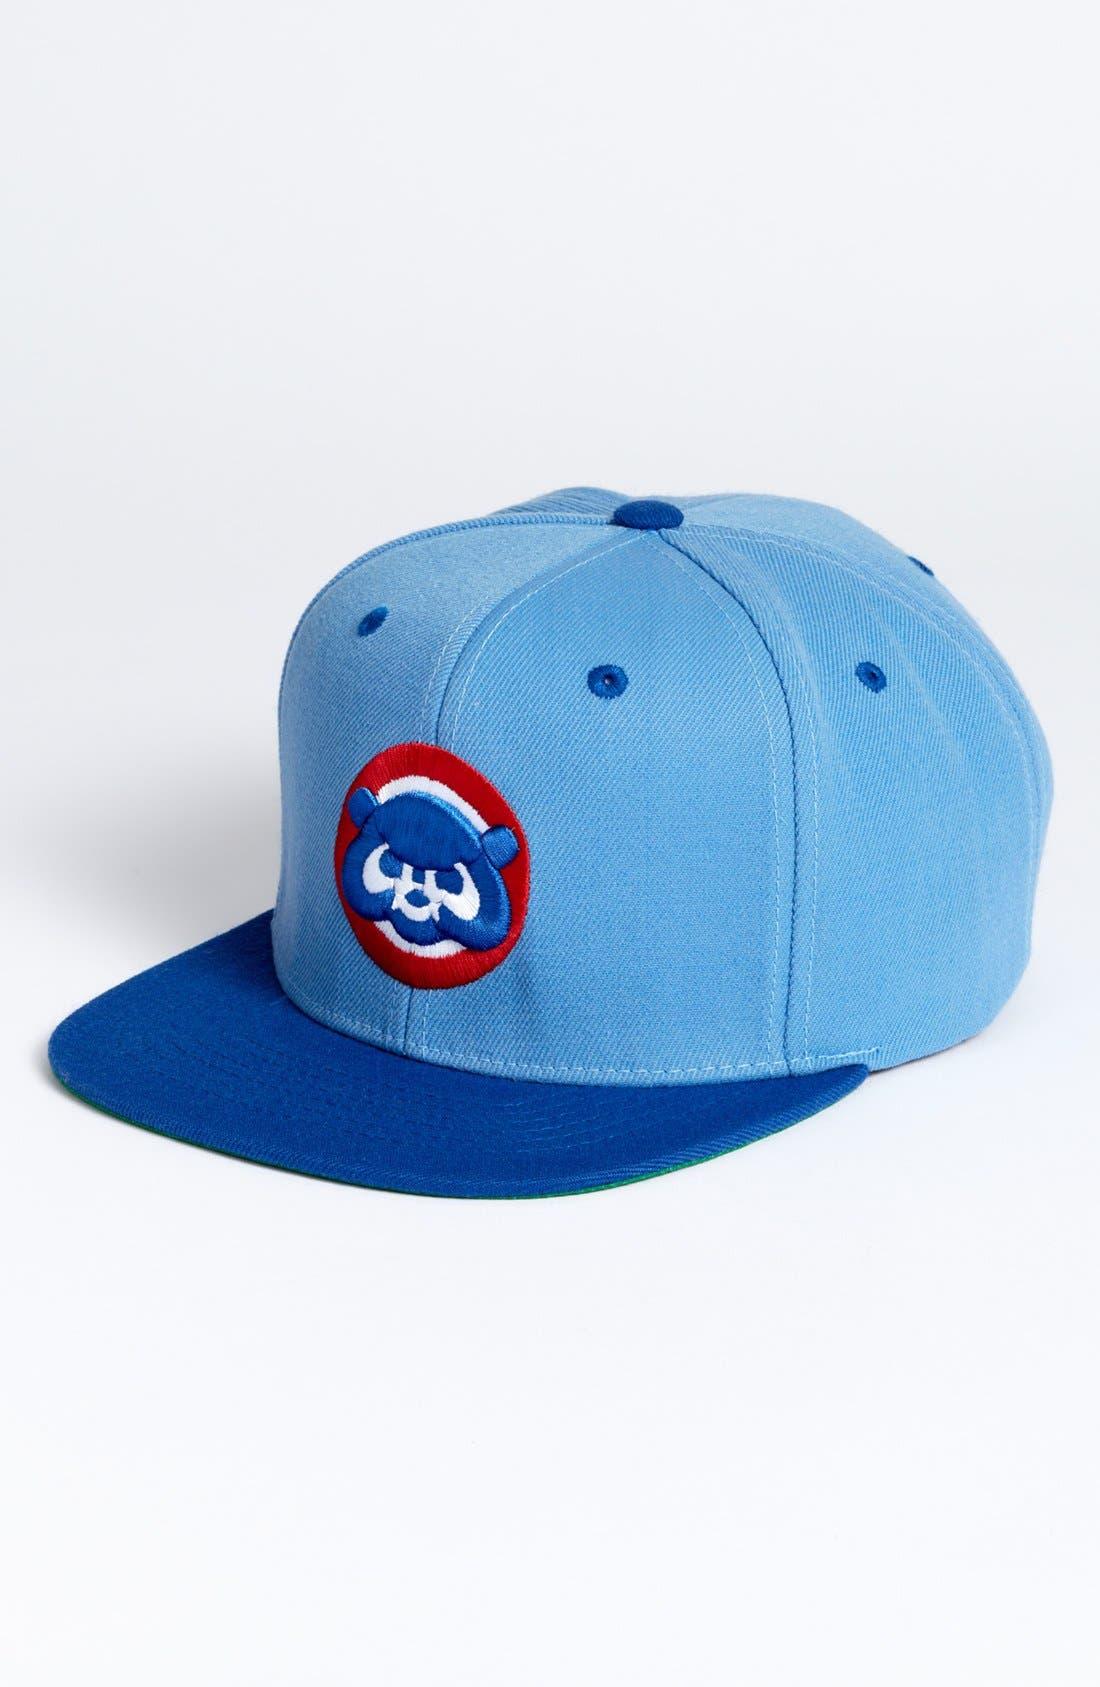 Main Image - American Needle 'Chicago Cubs - Back 2 Front' Snapback Baseball Cap